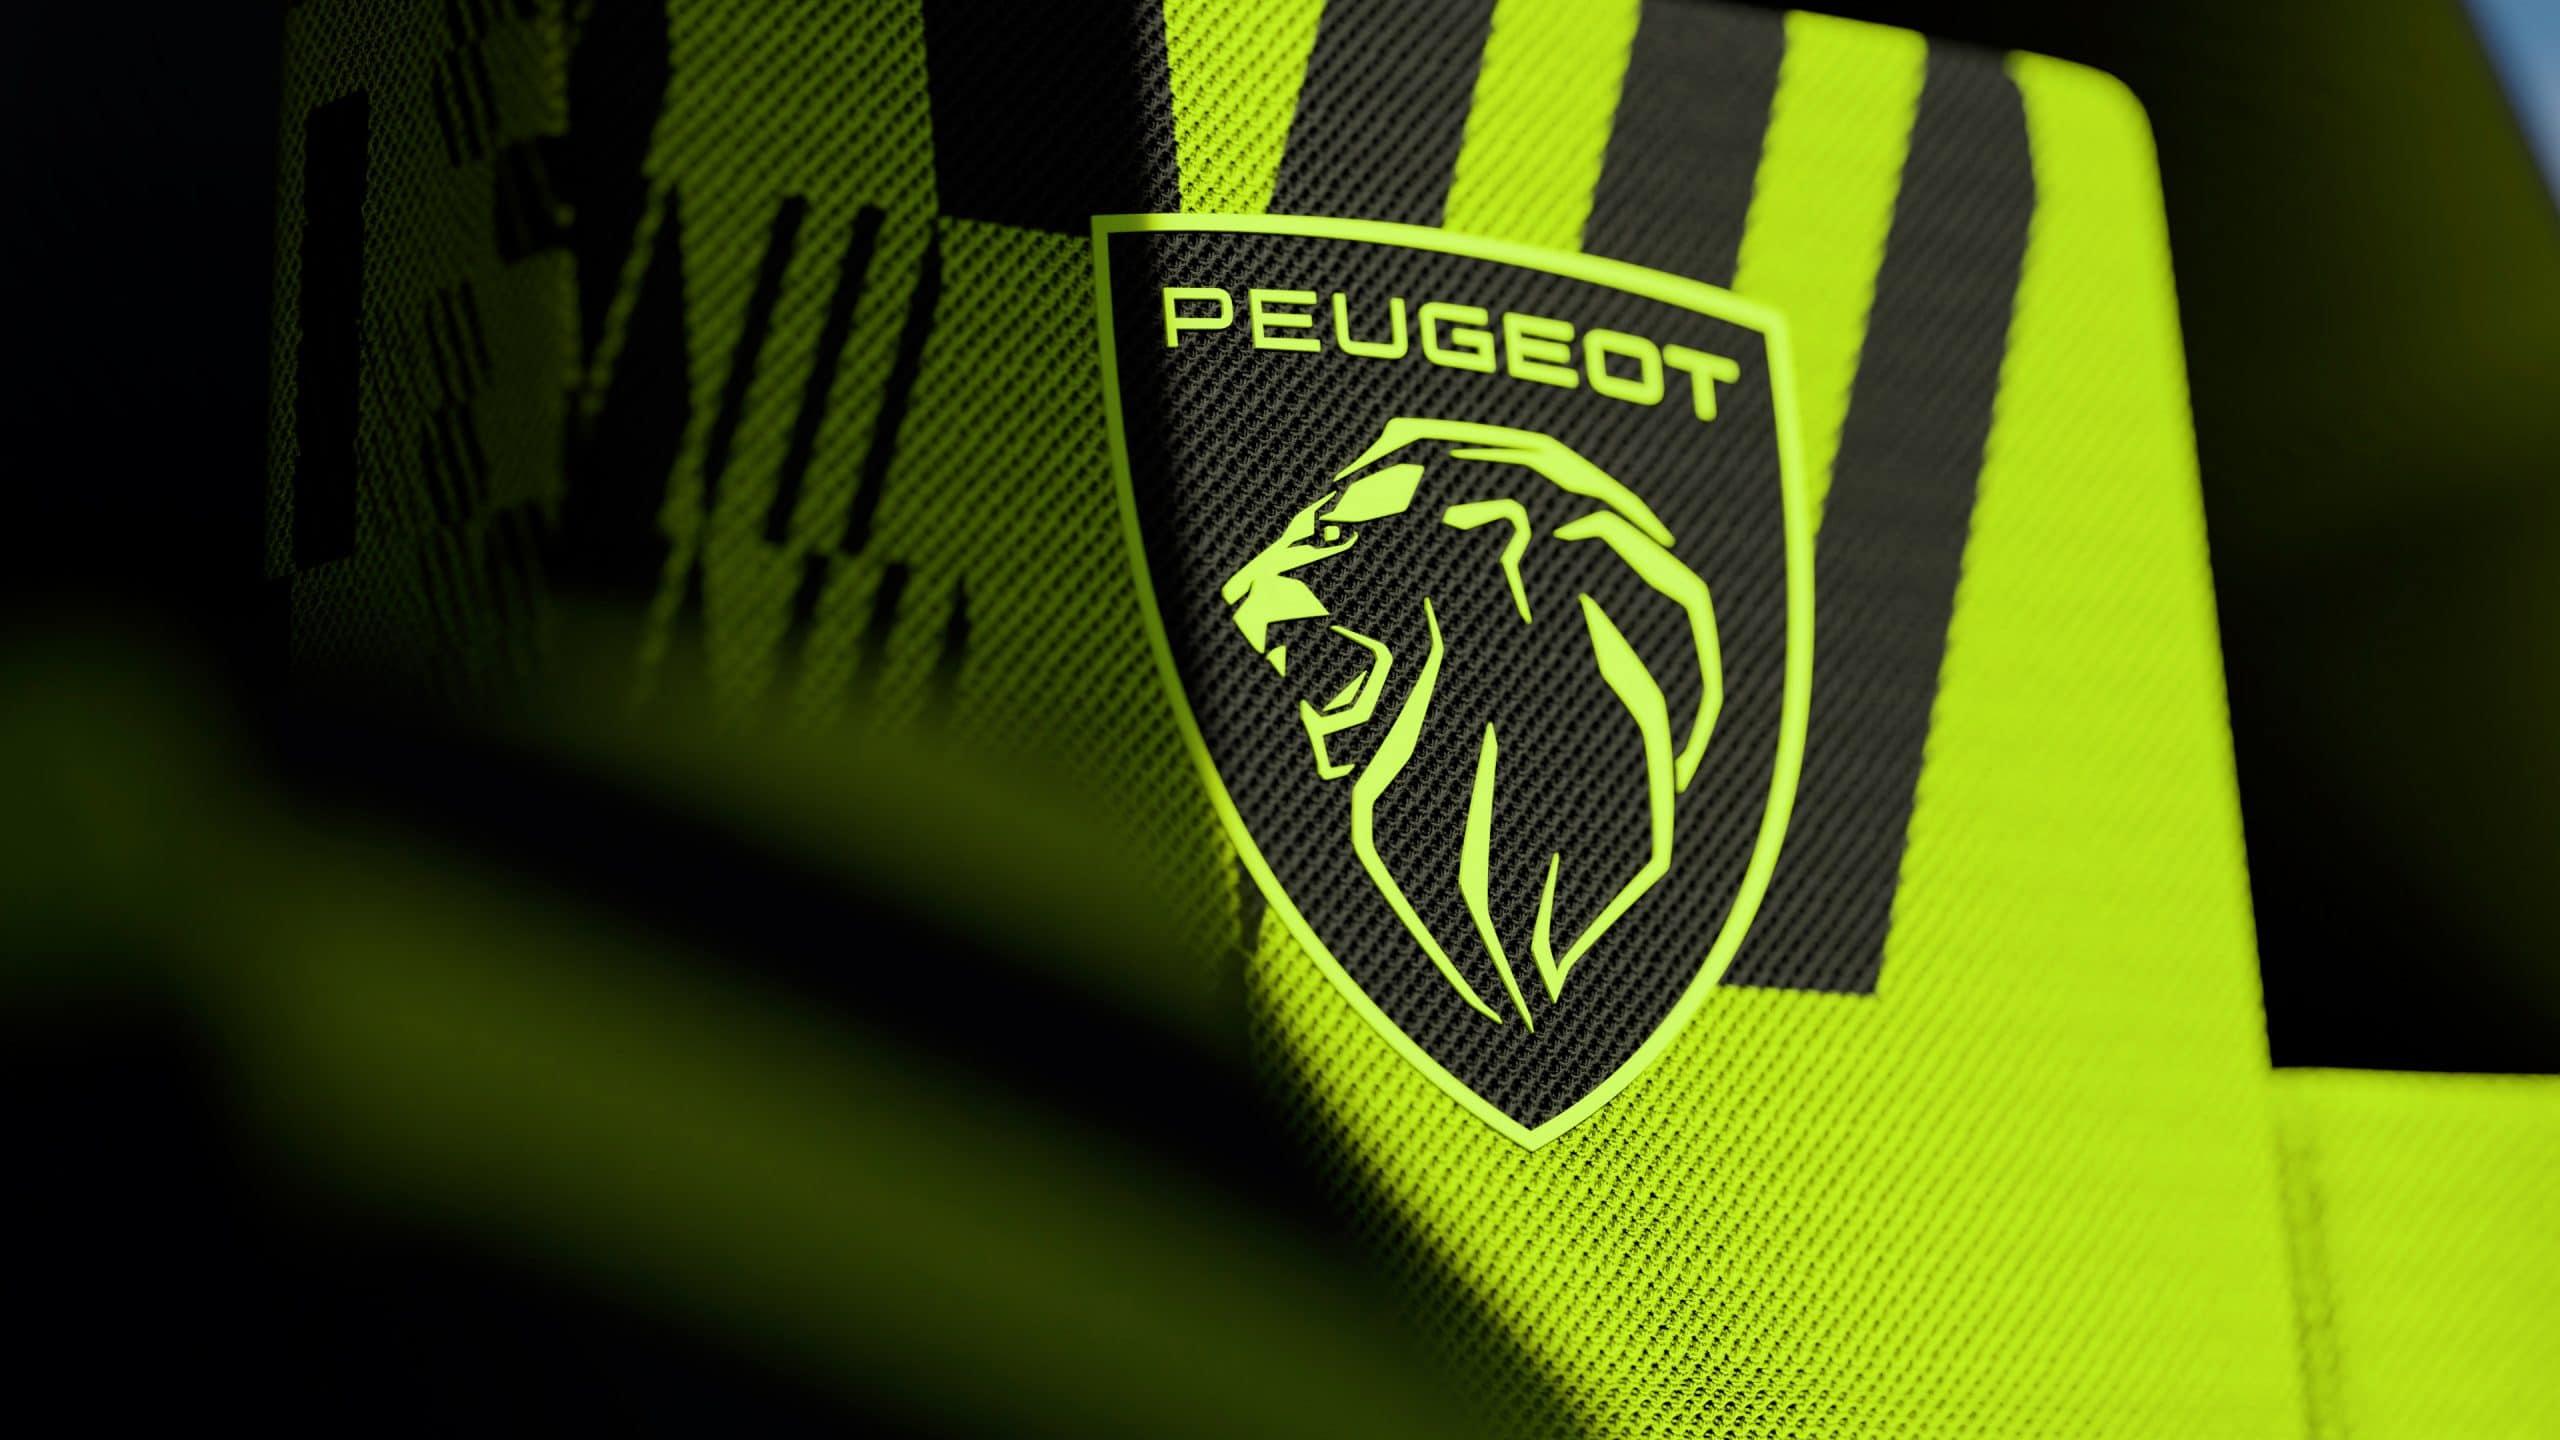 3115439 s6gyfgr2m7 scaled Αυτό είναι το hypercar της Peugeot 9X8, hypercar, Peugeot, Peugeot 9X8, supercar, supercars, zblog, ειδήσεις, Νέα